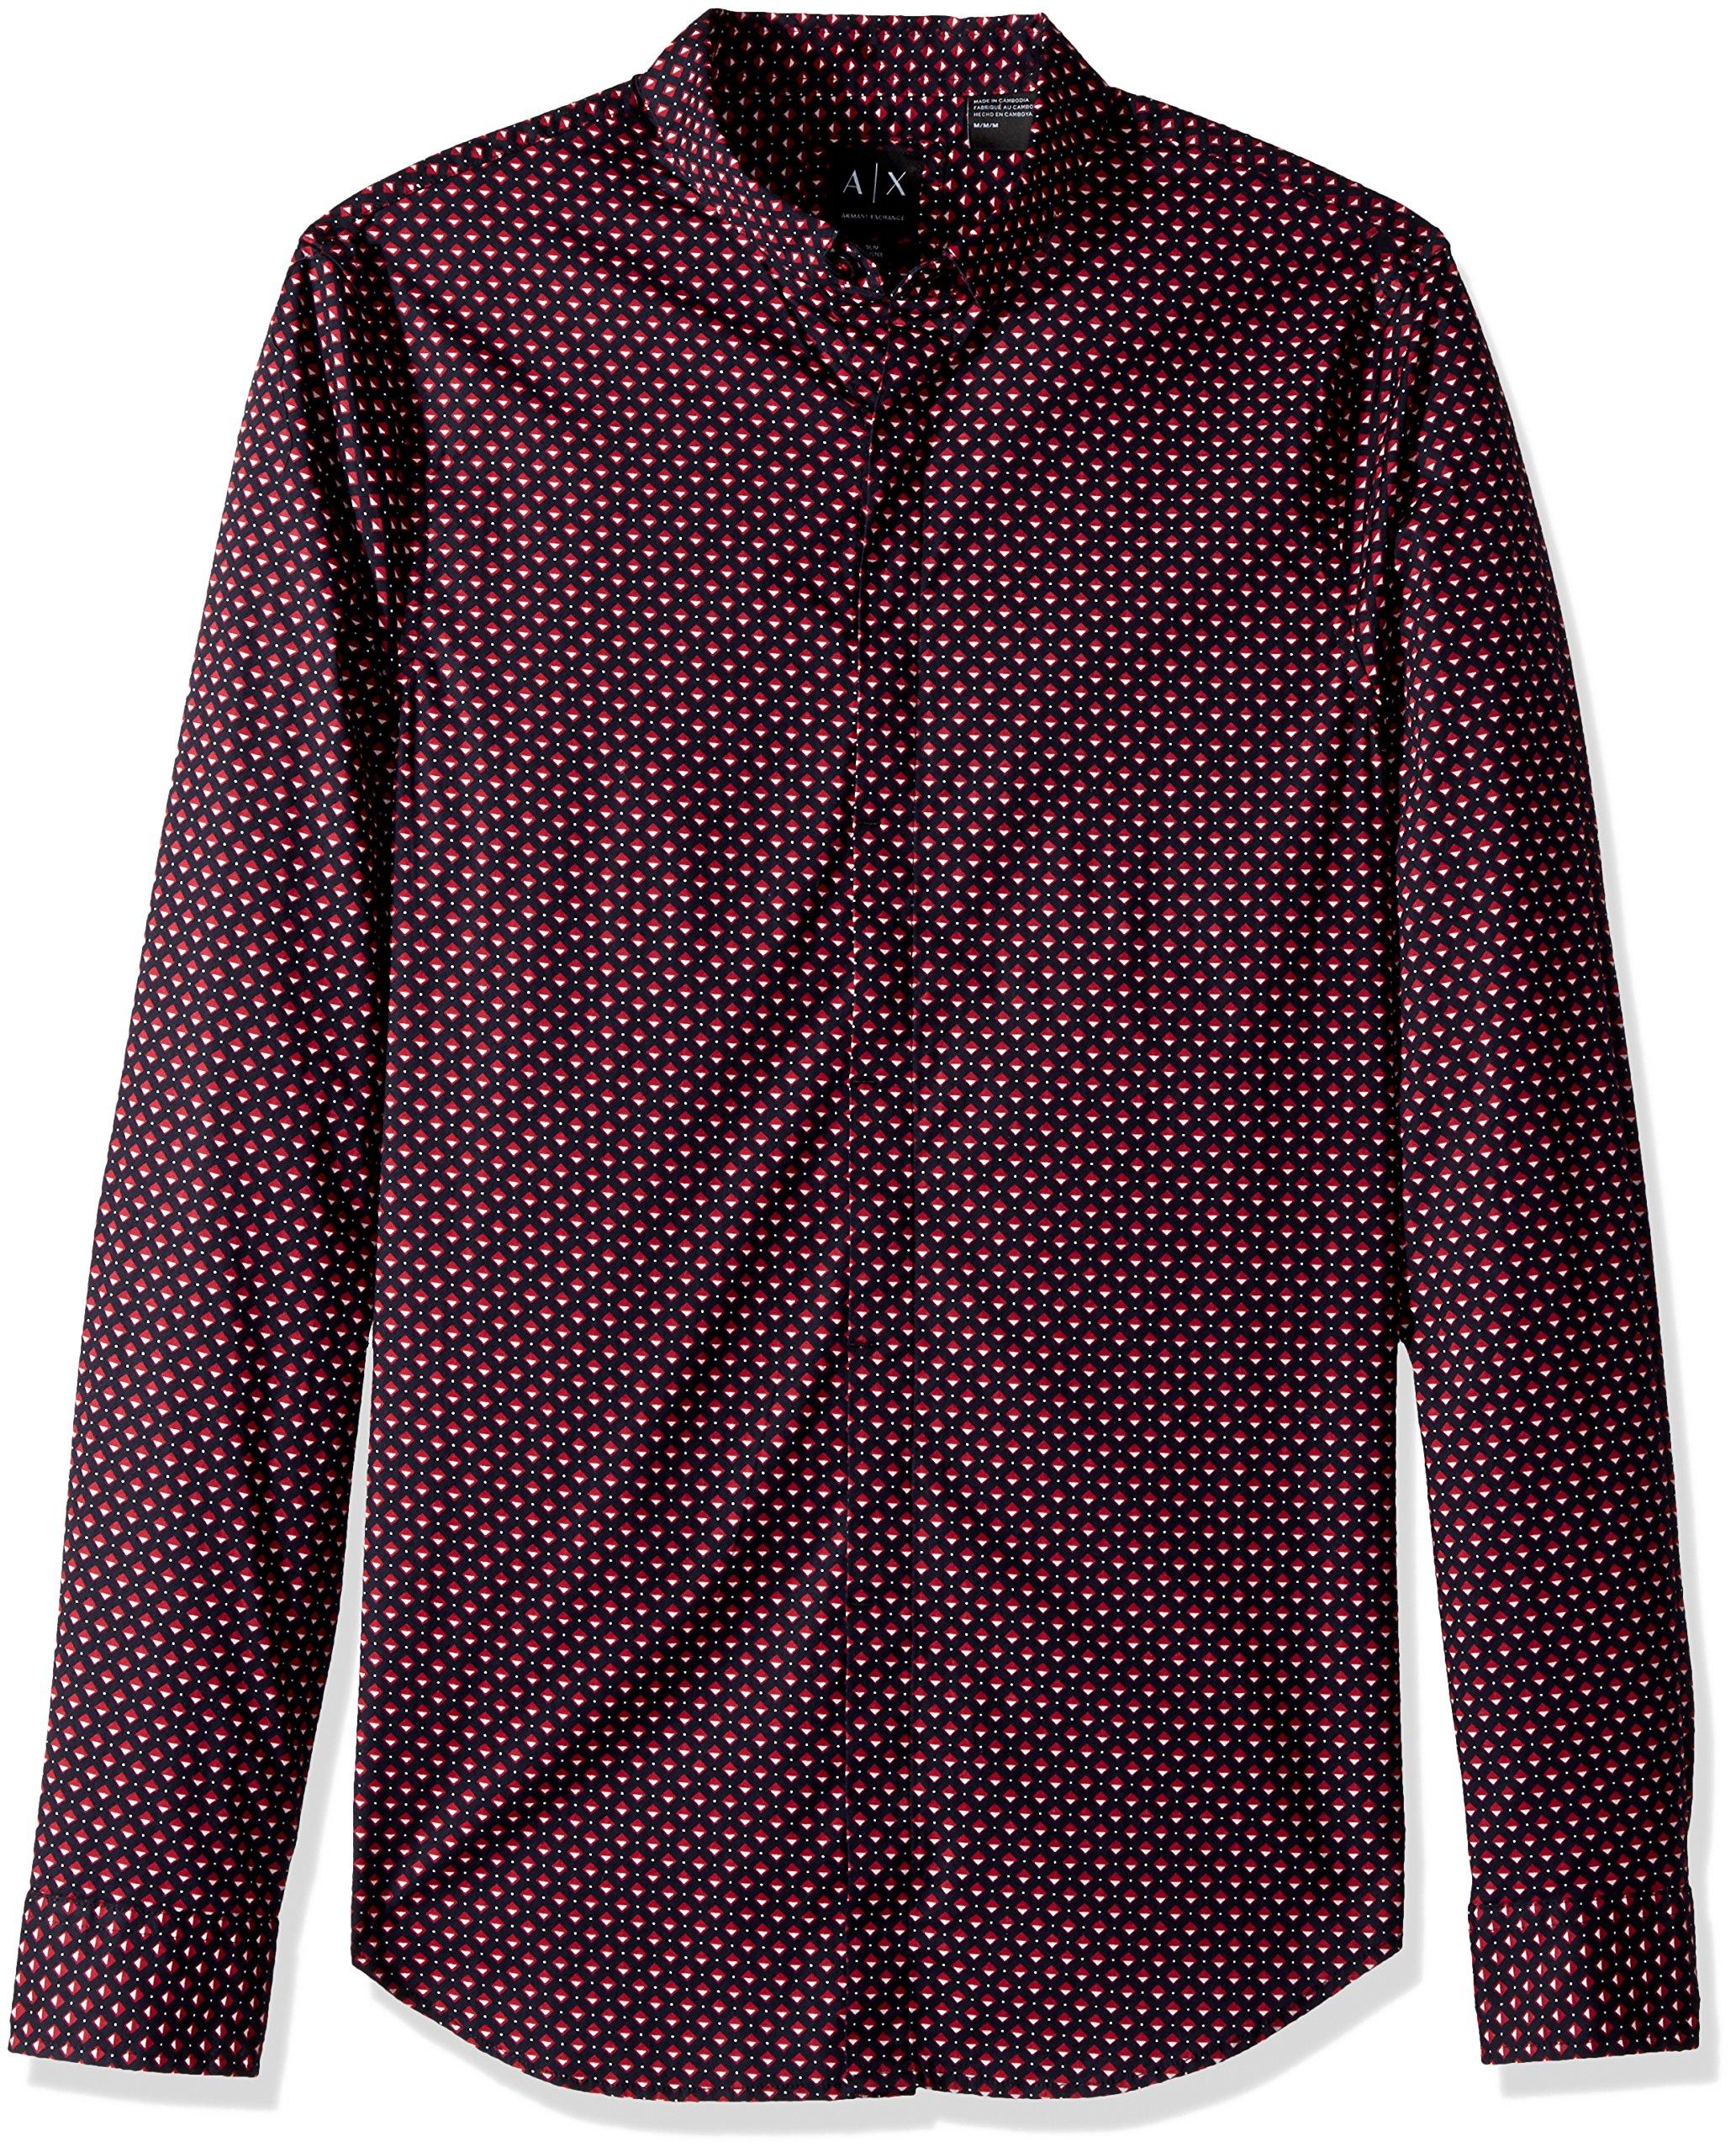 A|X Armani Exchange Men's Long Sleeve Printed Aramni Shirt, Navy/Square/Triangle, L